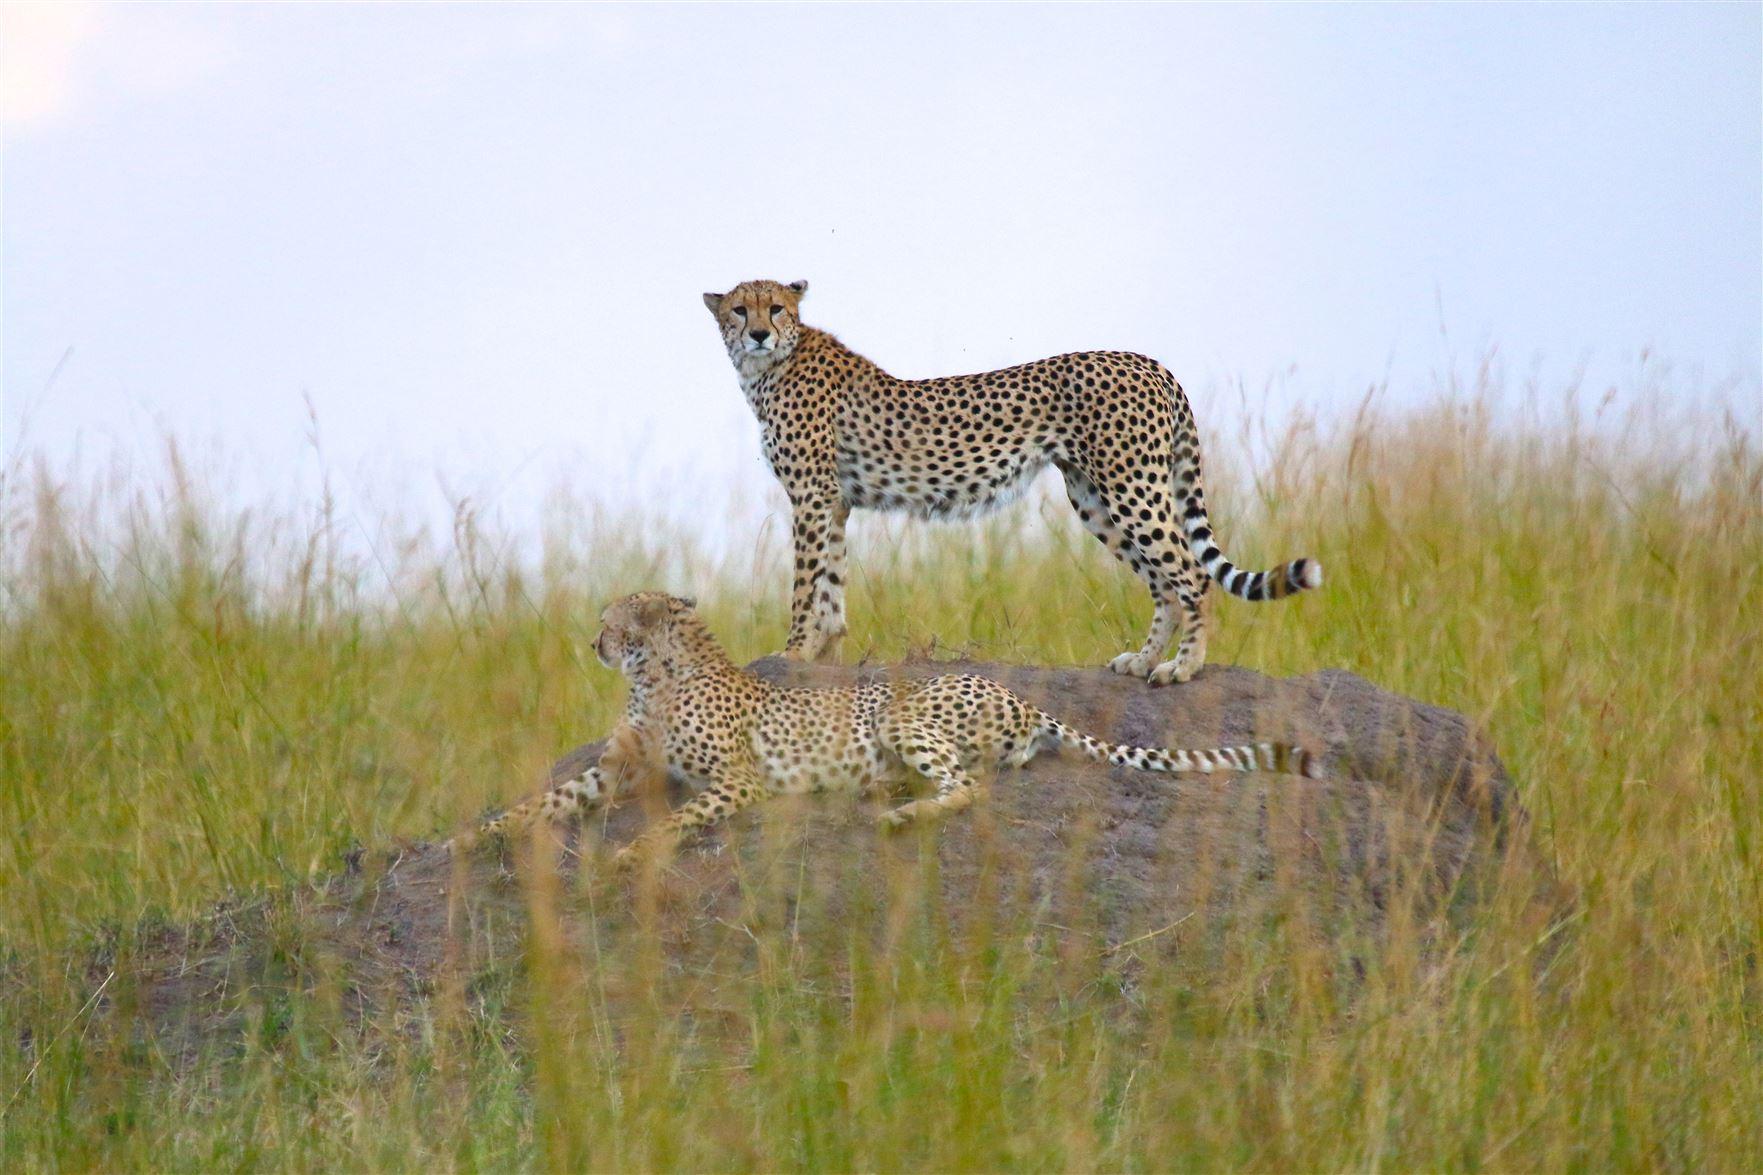 Jeff Campbell_Cheetahs, Serengeti National Park, Tanzania_resized.jpg